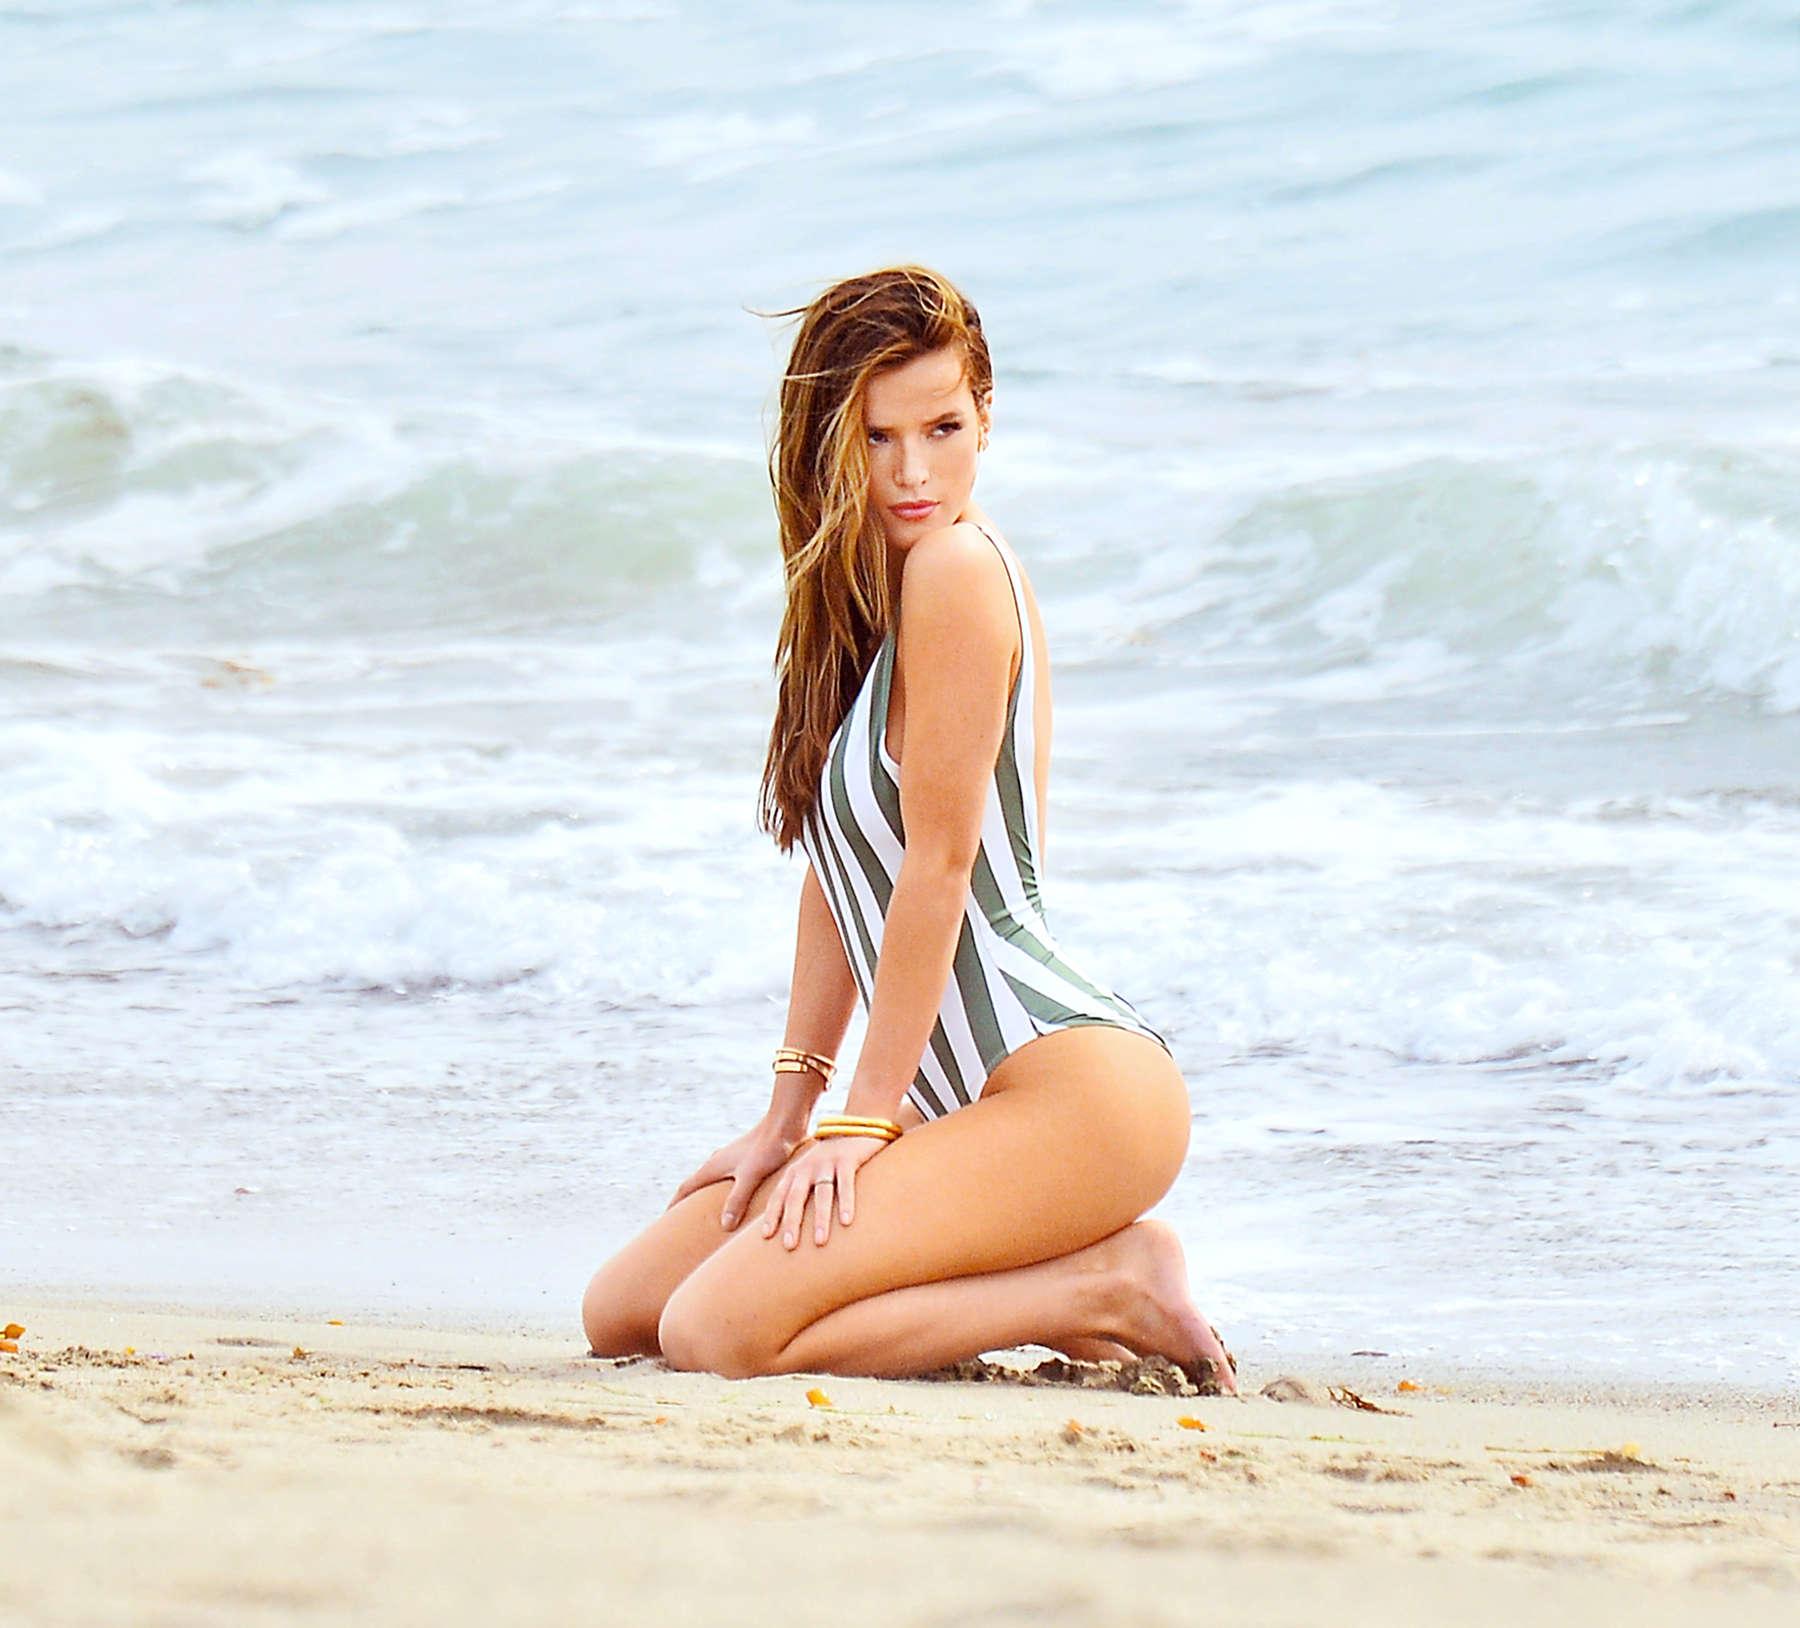 Bella Thorne 2016 : Bella Thorne: Swimsuit Photoshoot 2016 -02